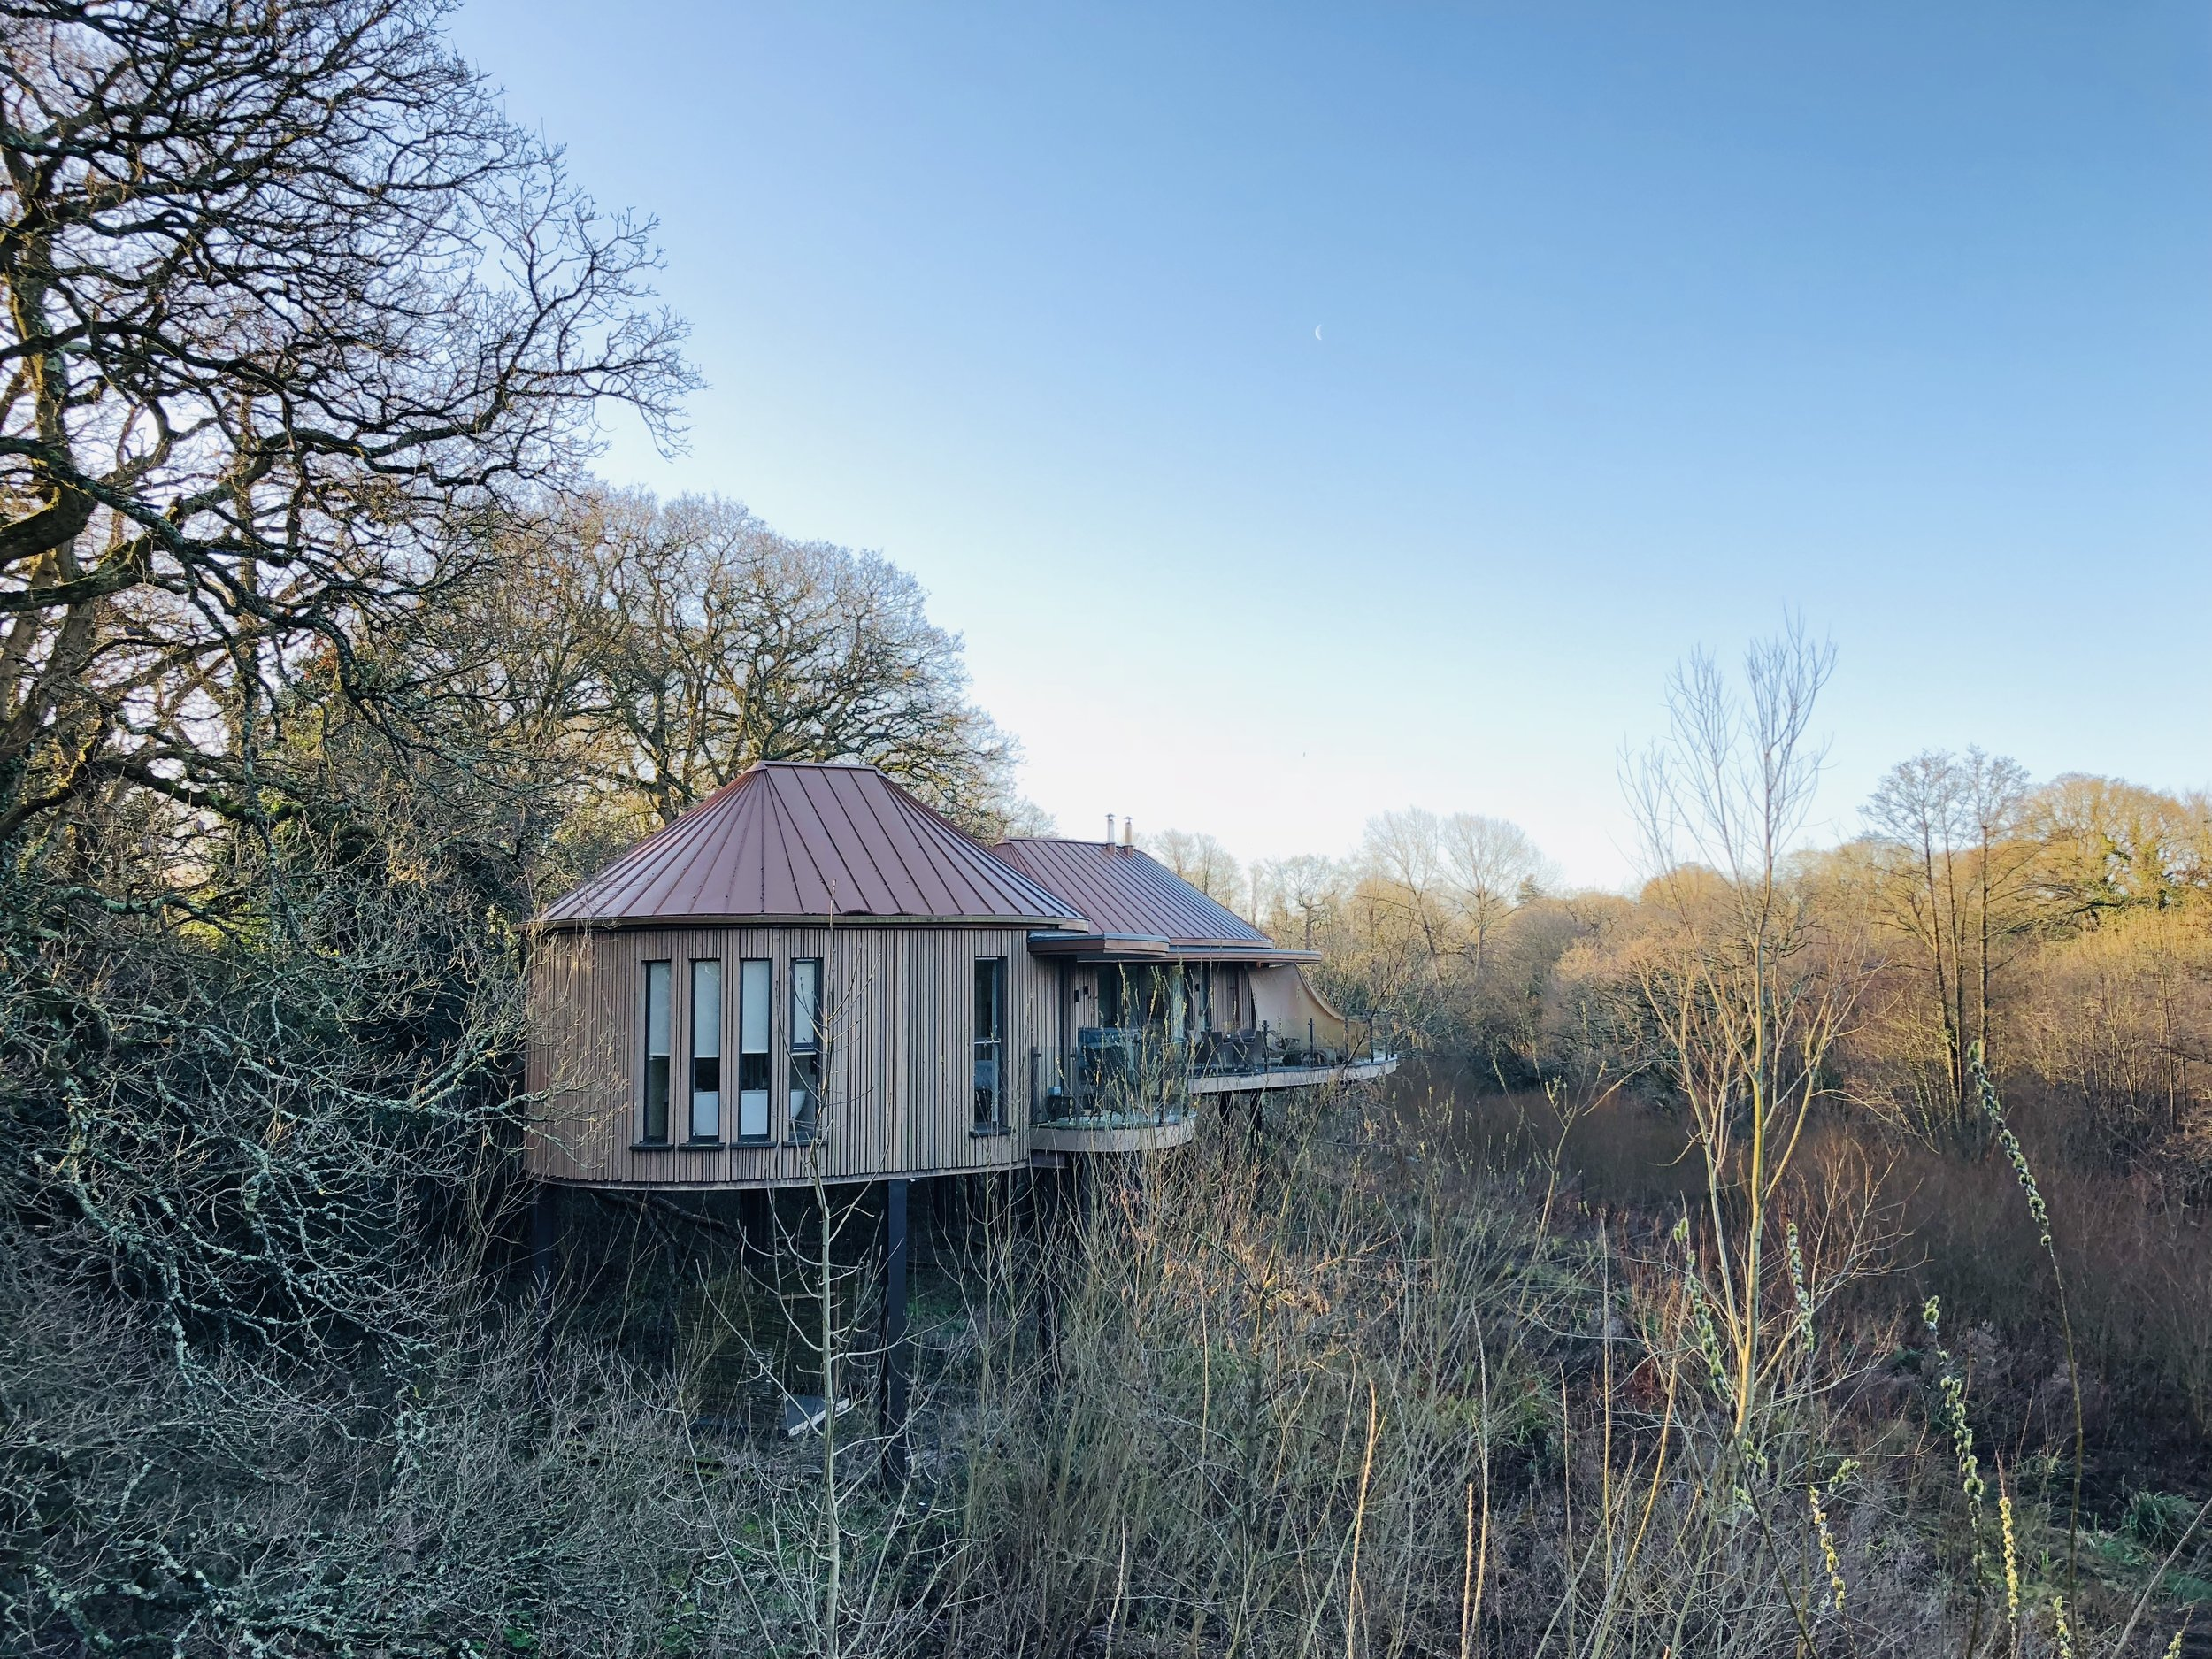 chewton_glen_treehouse.jpg